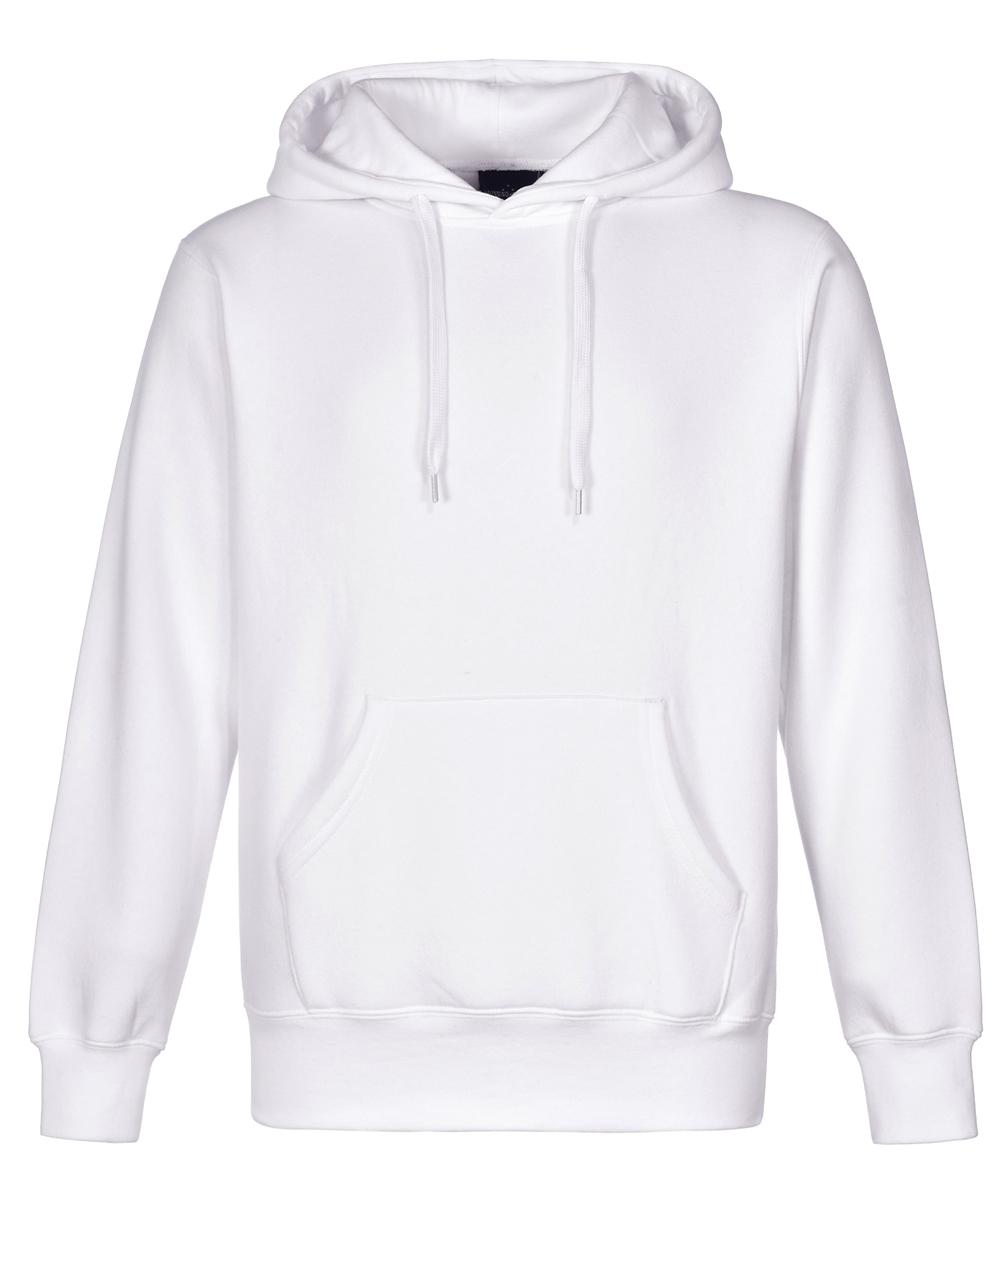 White.White